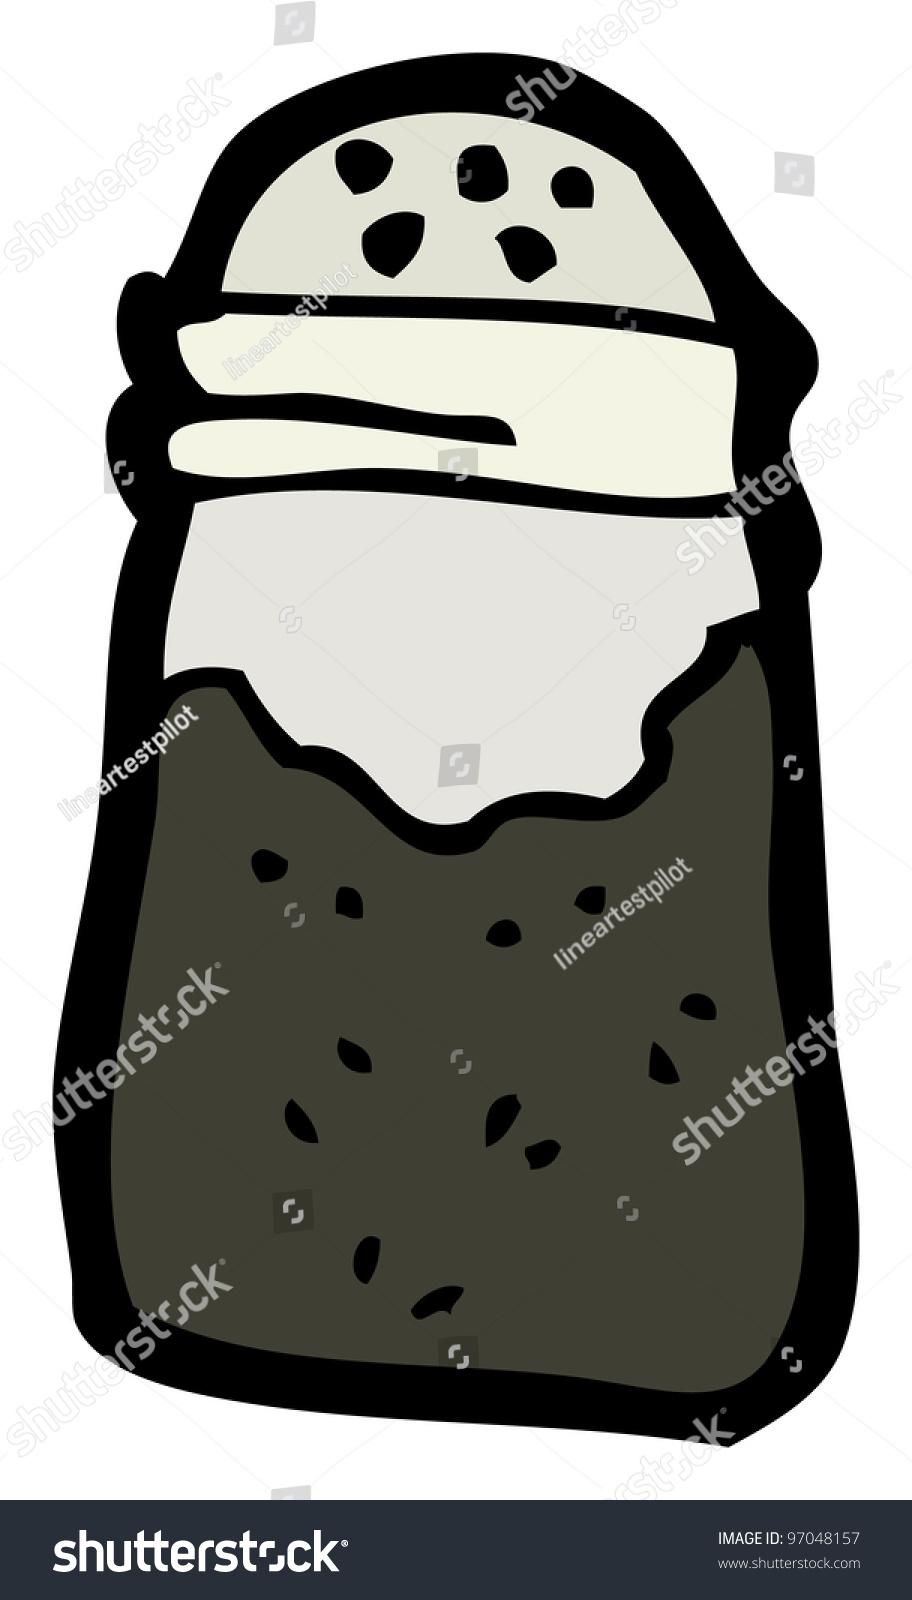 Cartoon Pepper Shaker Stock Illustration 97048157 - Shutterstock